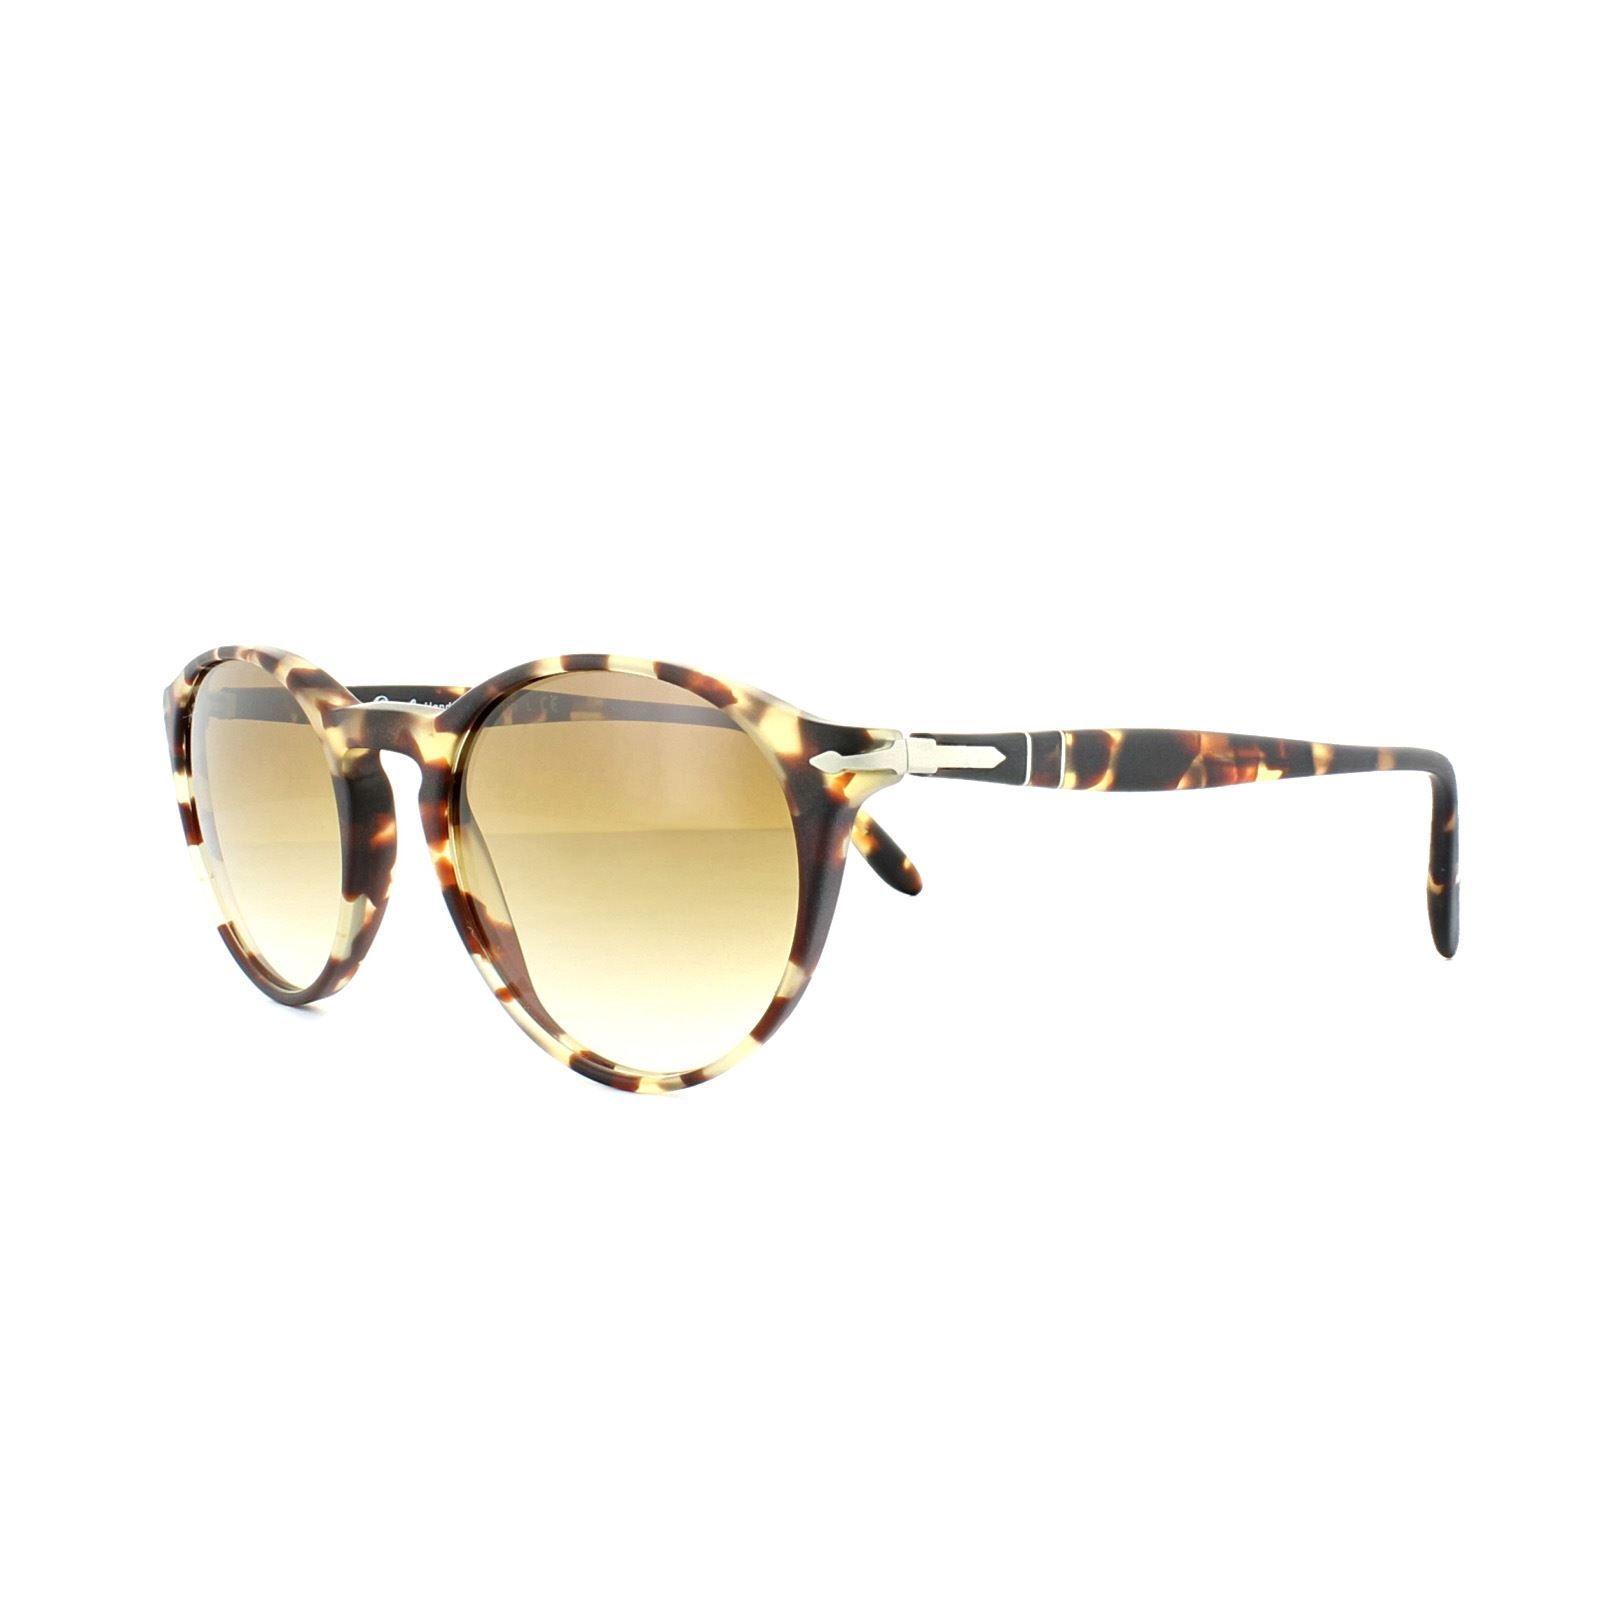 Persol Sunglasses 3092SM 900551 Tabacco Virginia Antique Brown Gradient